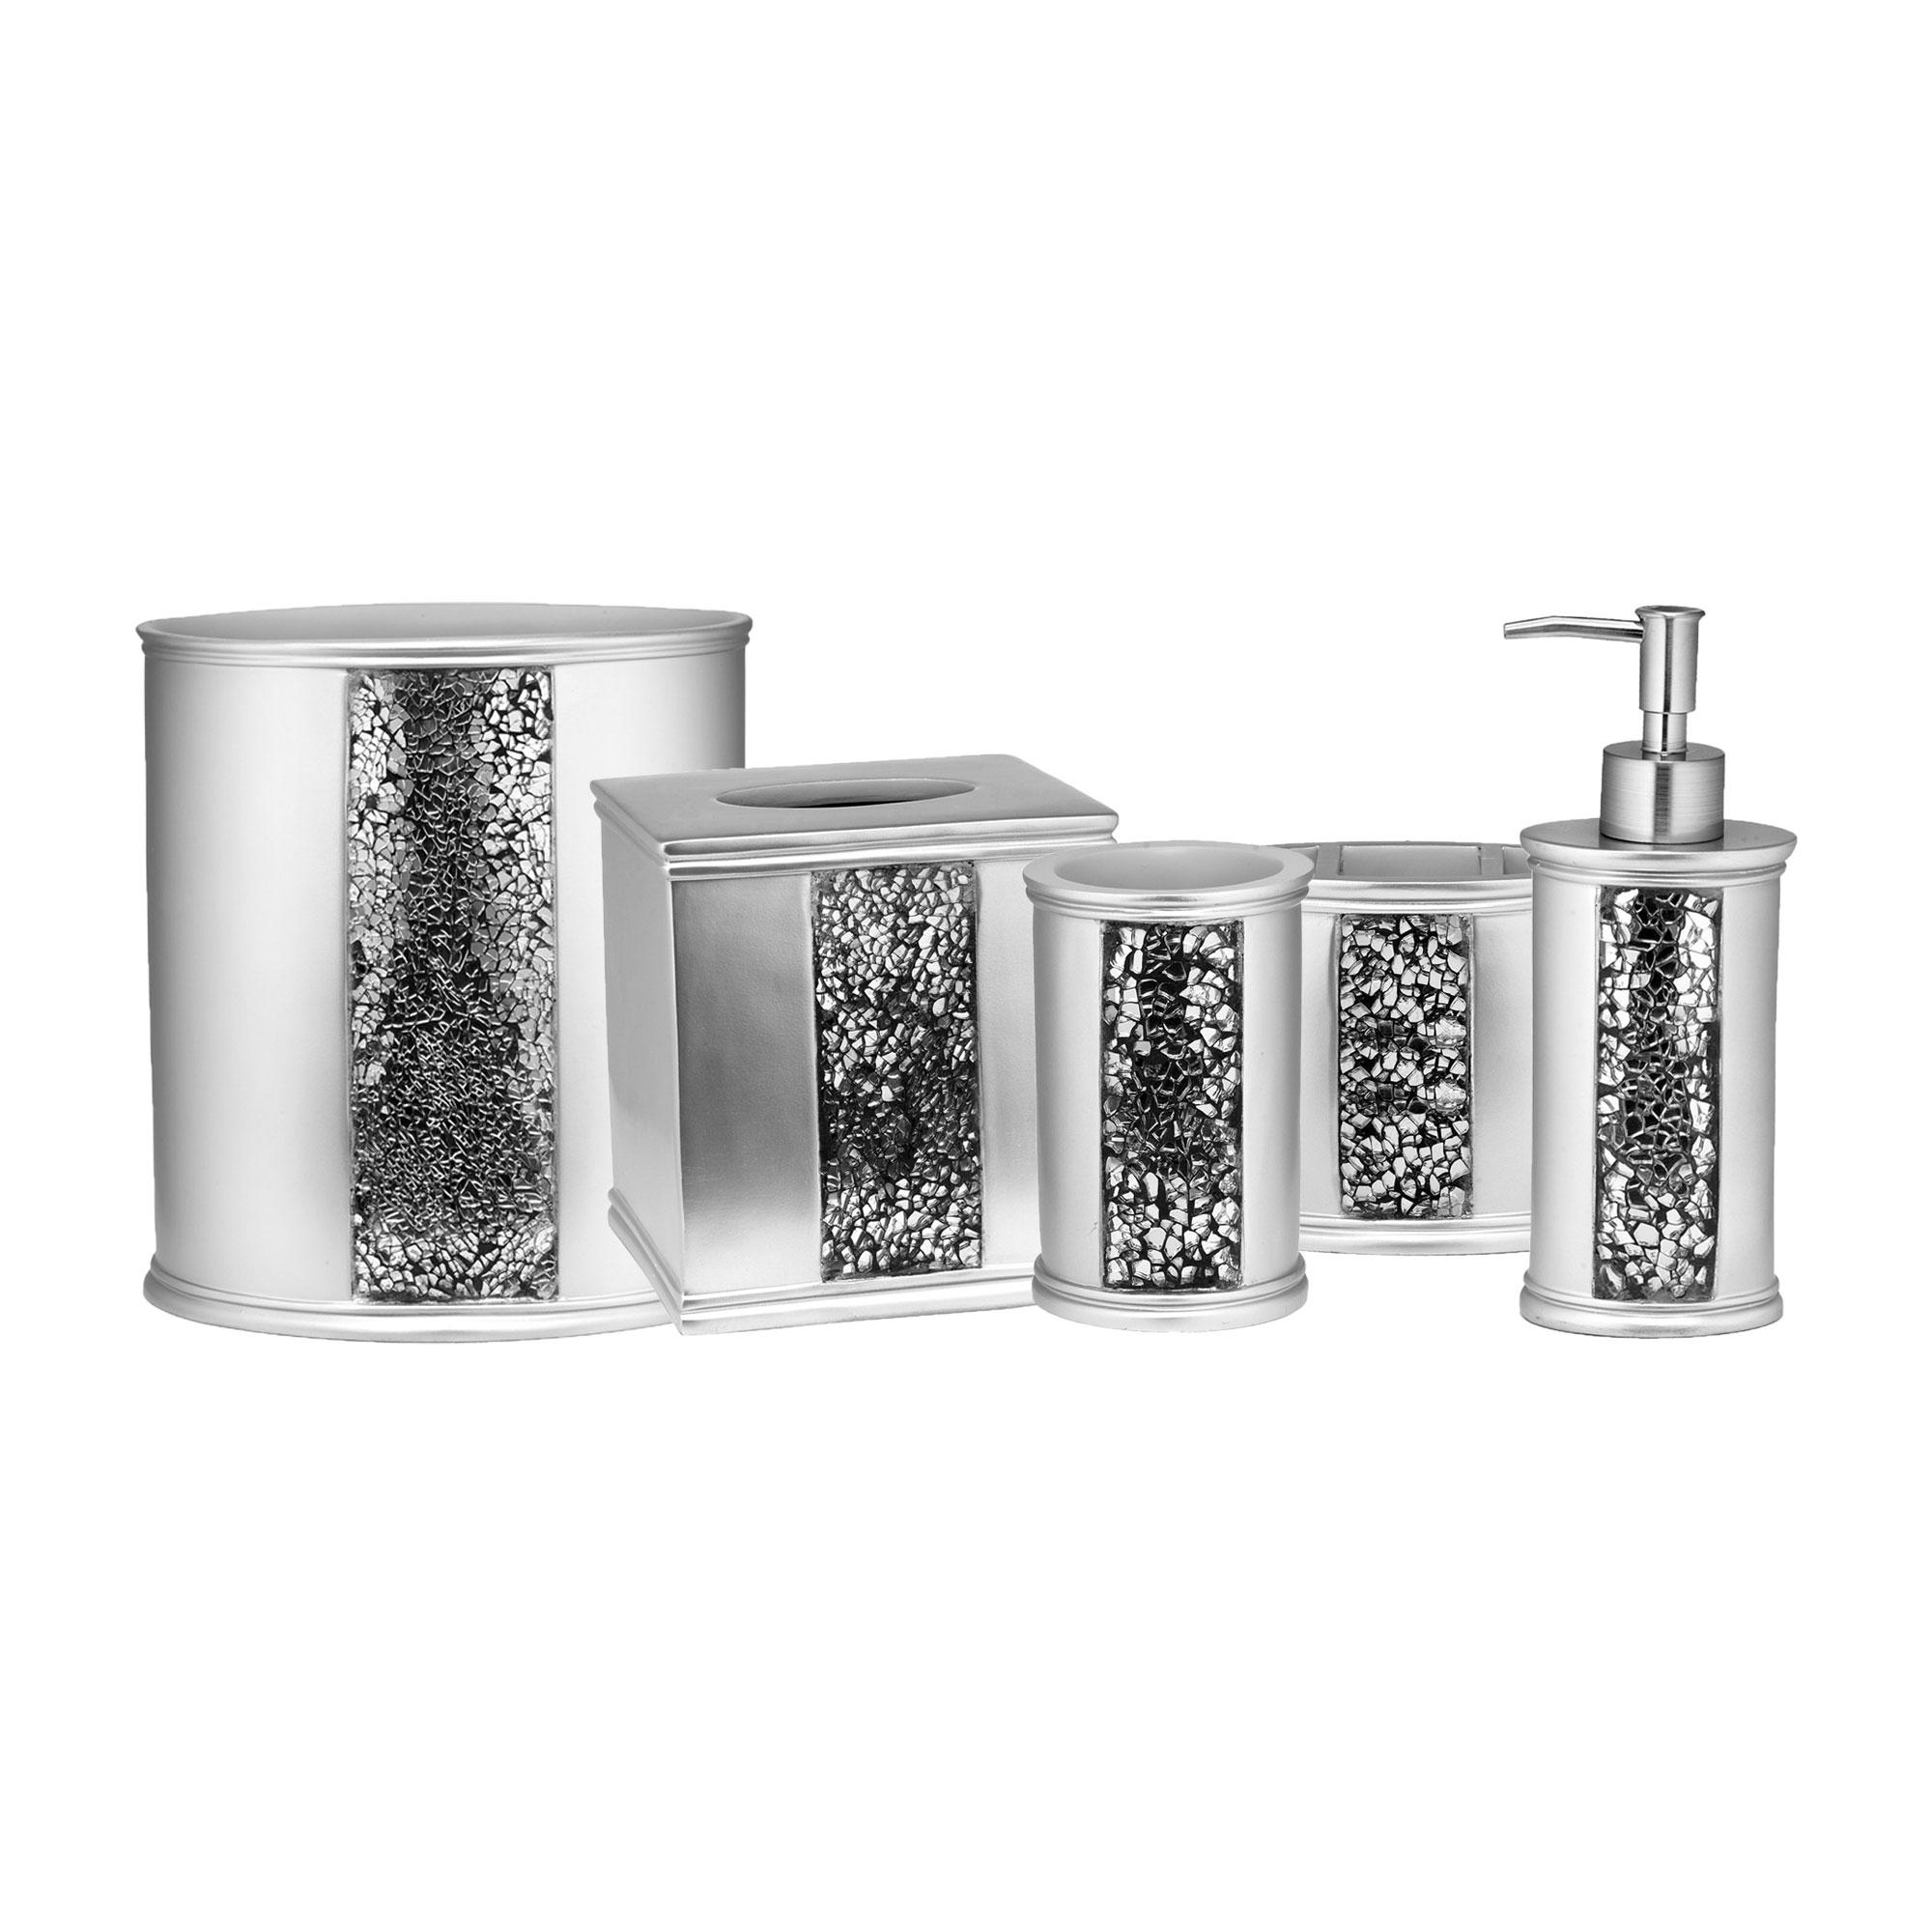 Designer Designer Designer Home 13-PC Full Bath Accessories  Includes Curtain, Towel Sets, Rug Set 264884